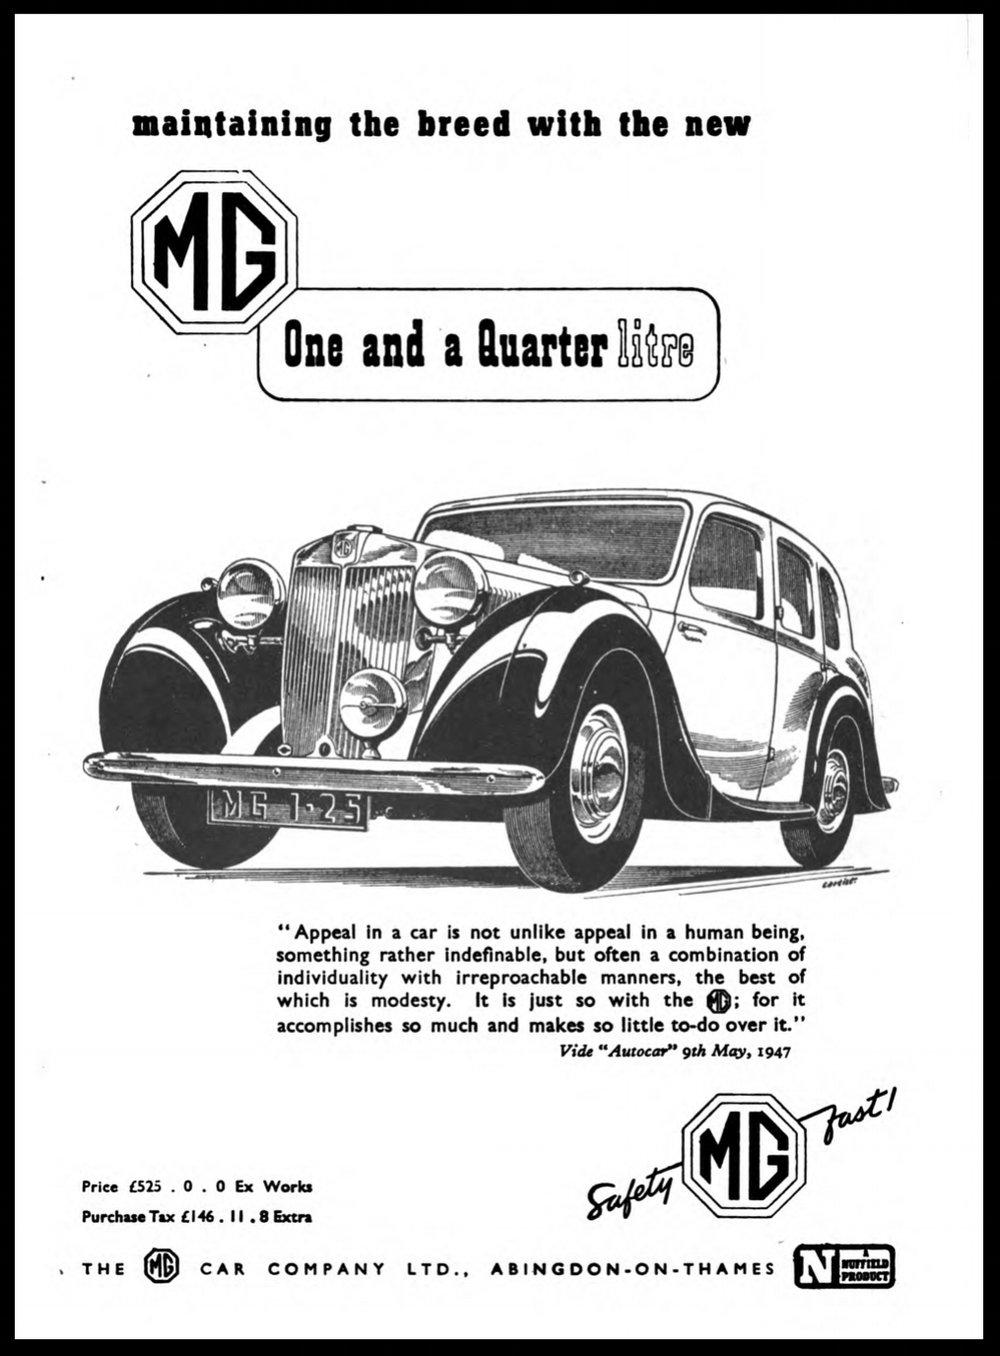 MG Triumph Sunbeam Jag - All British Cars — The Bowsing Ken